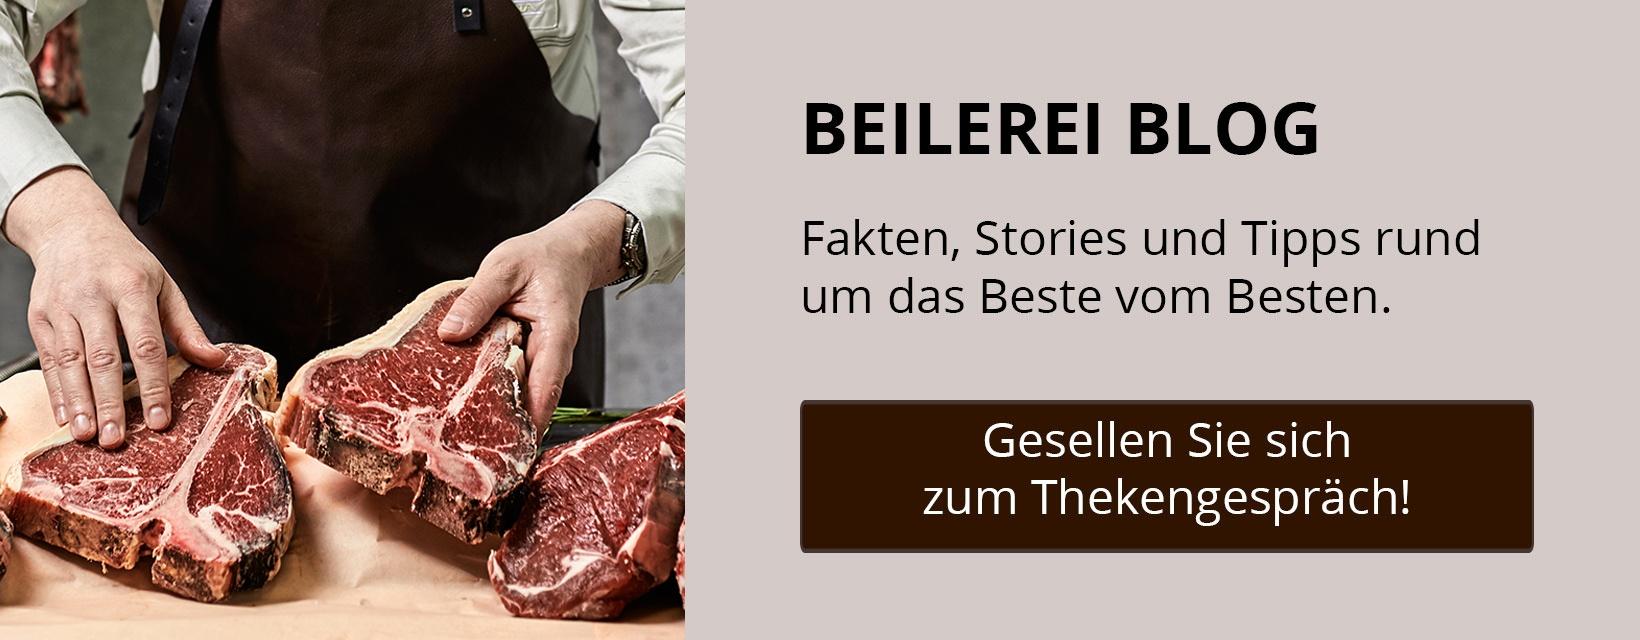 Thekengespräche Beilerei